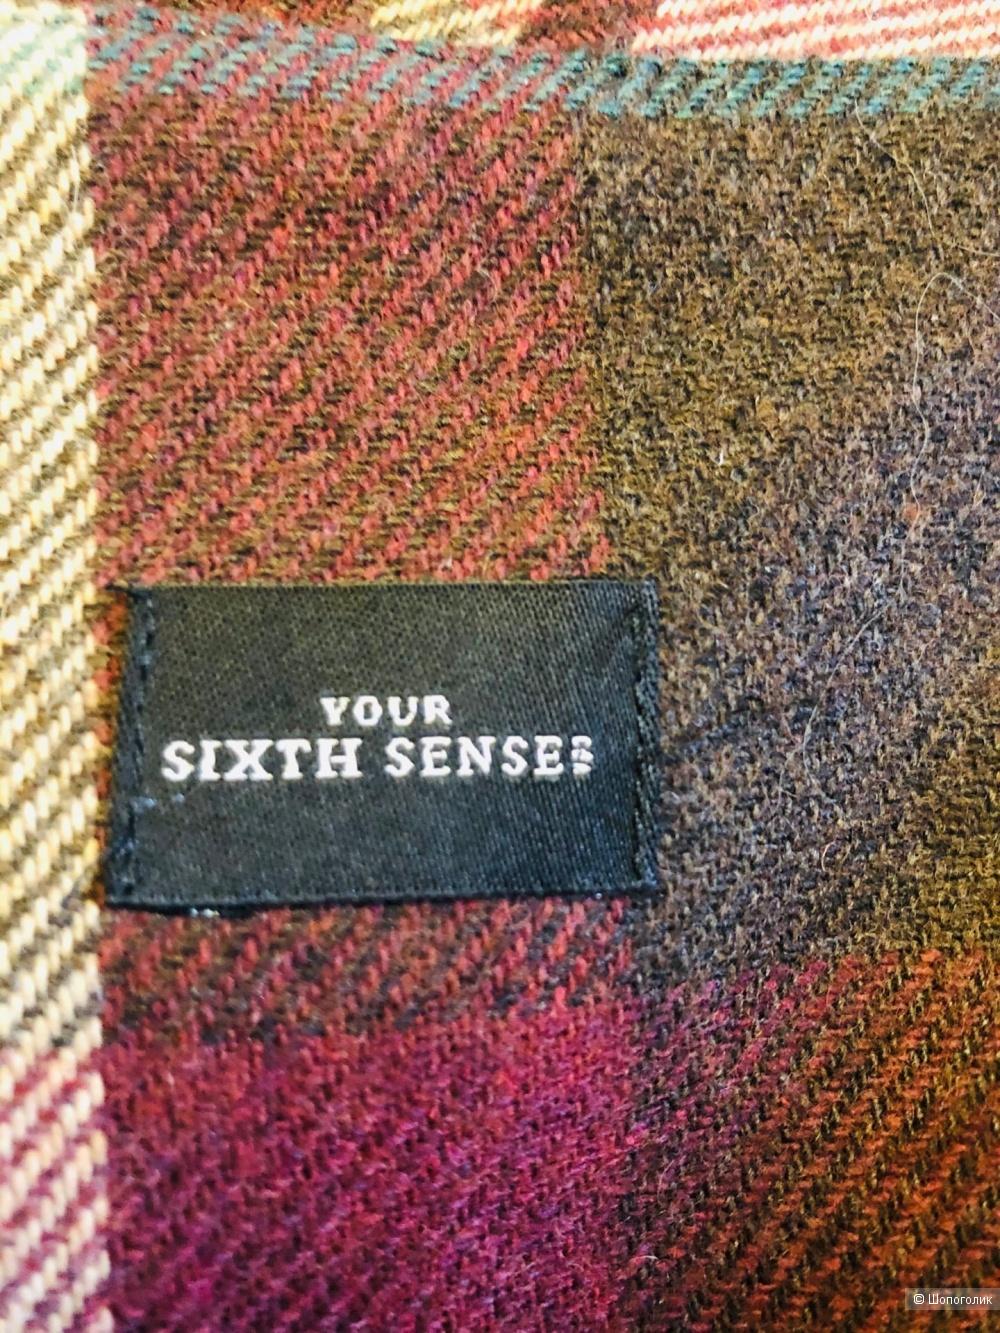 Юбка Your Sixth Sense. Размер М-L.